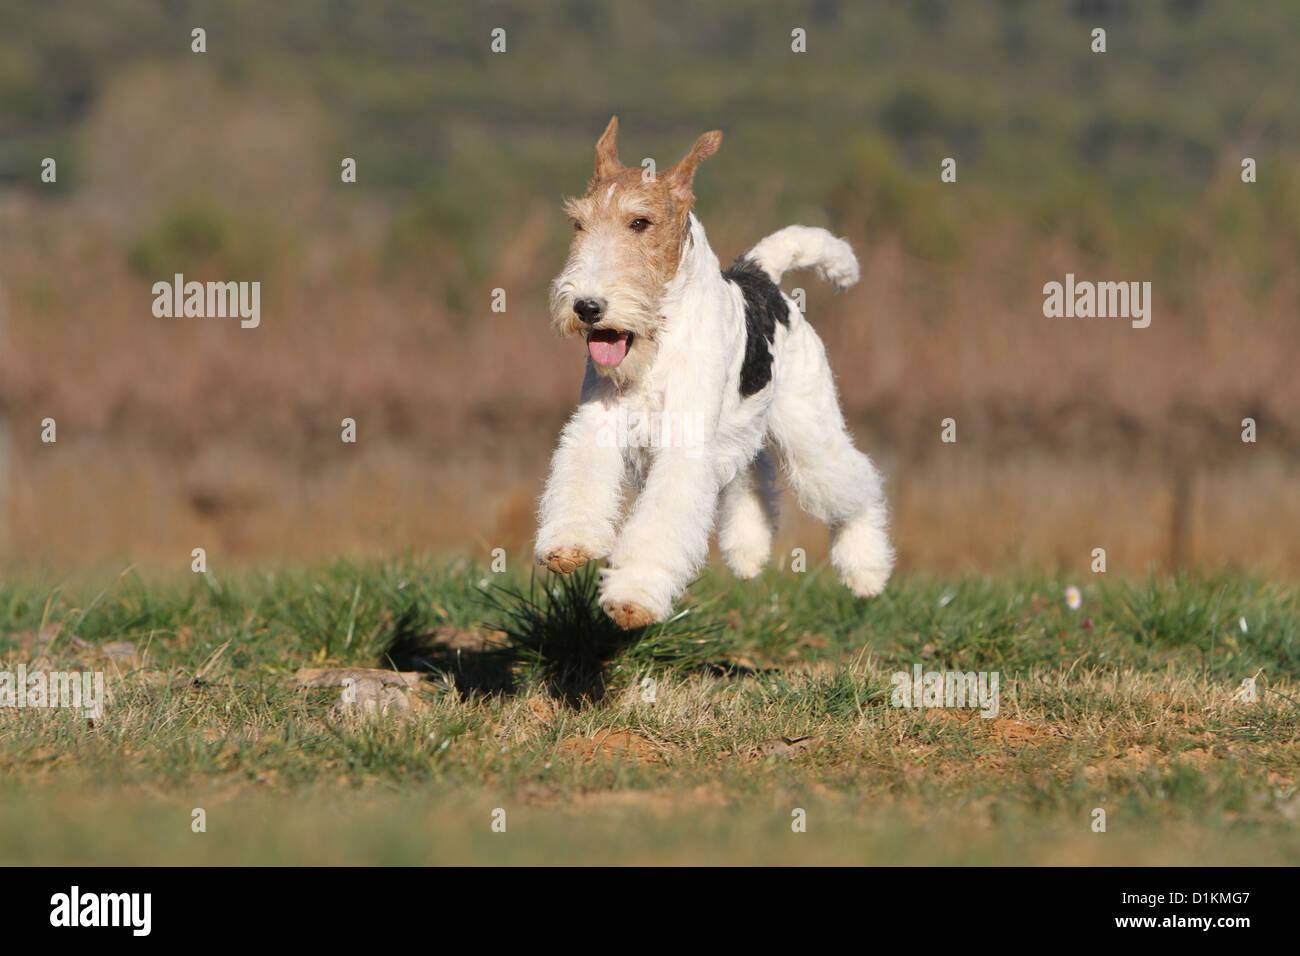 Fox Jumping Stockfotos & Fox Jumping Bilder - Seite 3 - Alamy